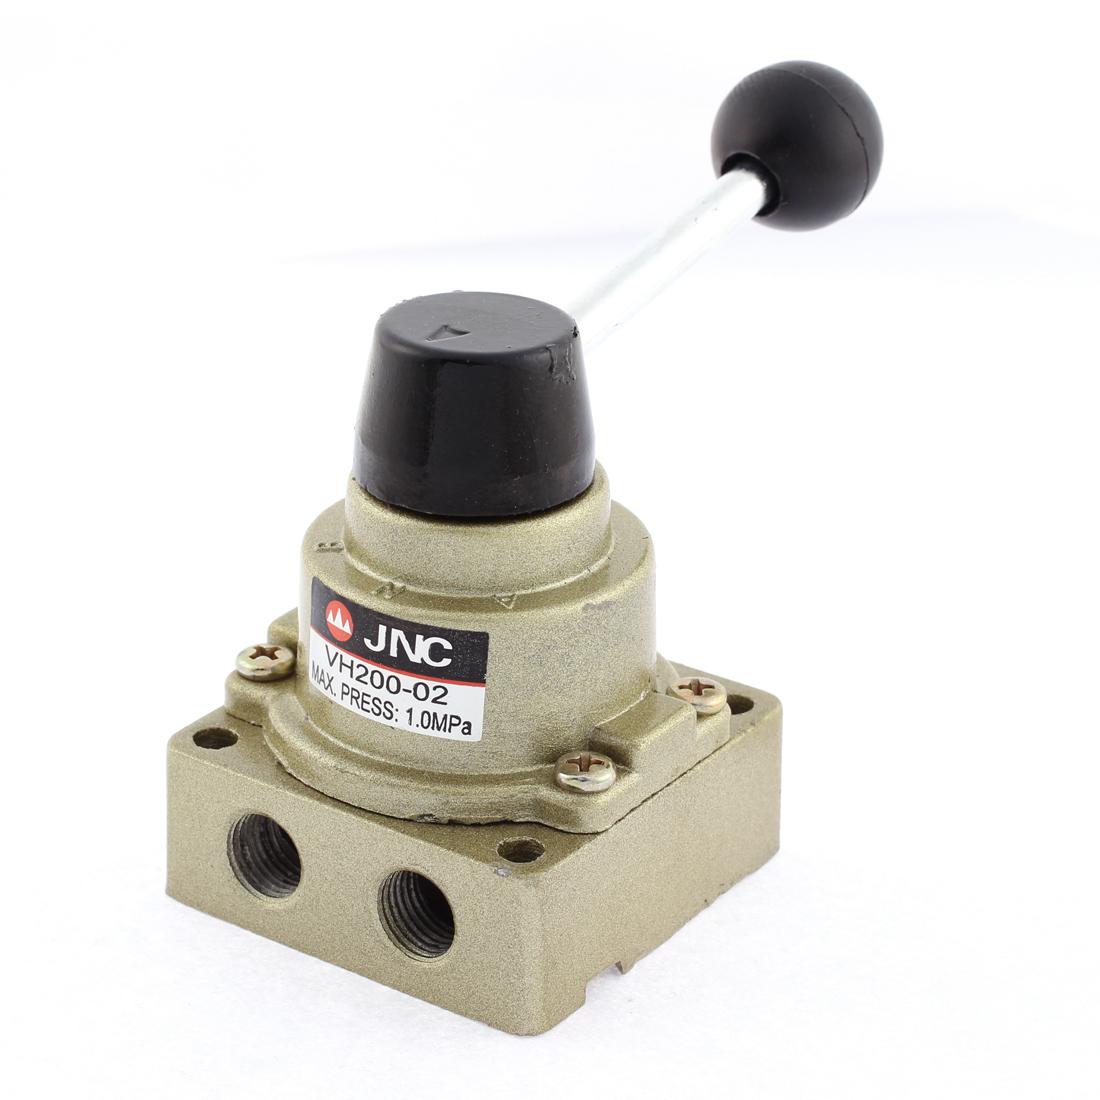 Pneumatic Air Flow Control Hand Lever Valve 1.0MPa 1/4 PT VH200-02